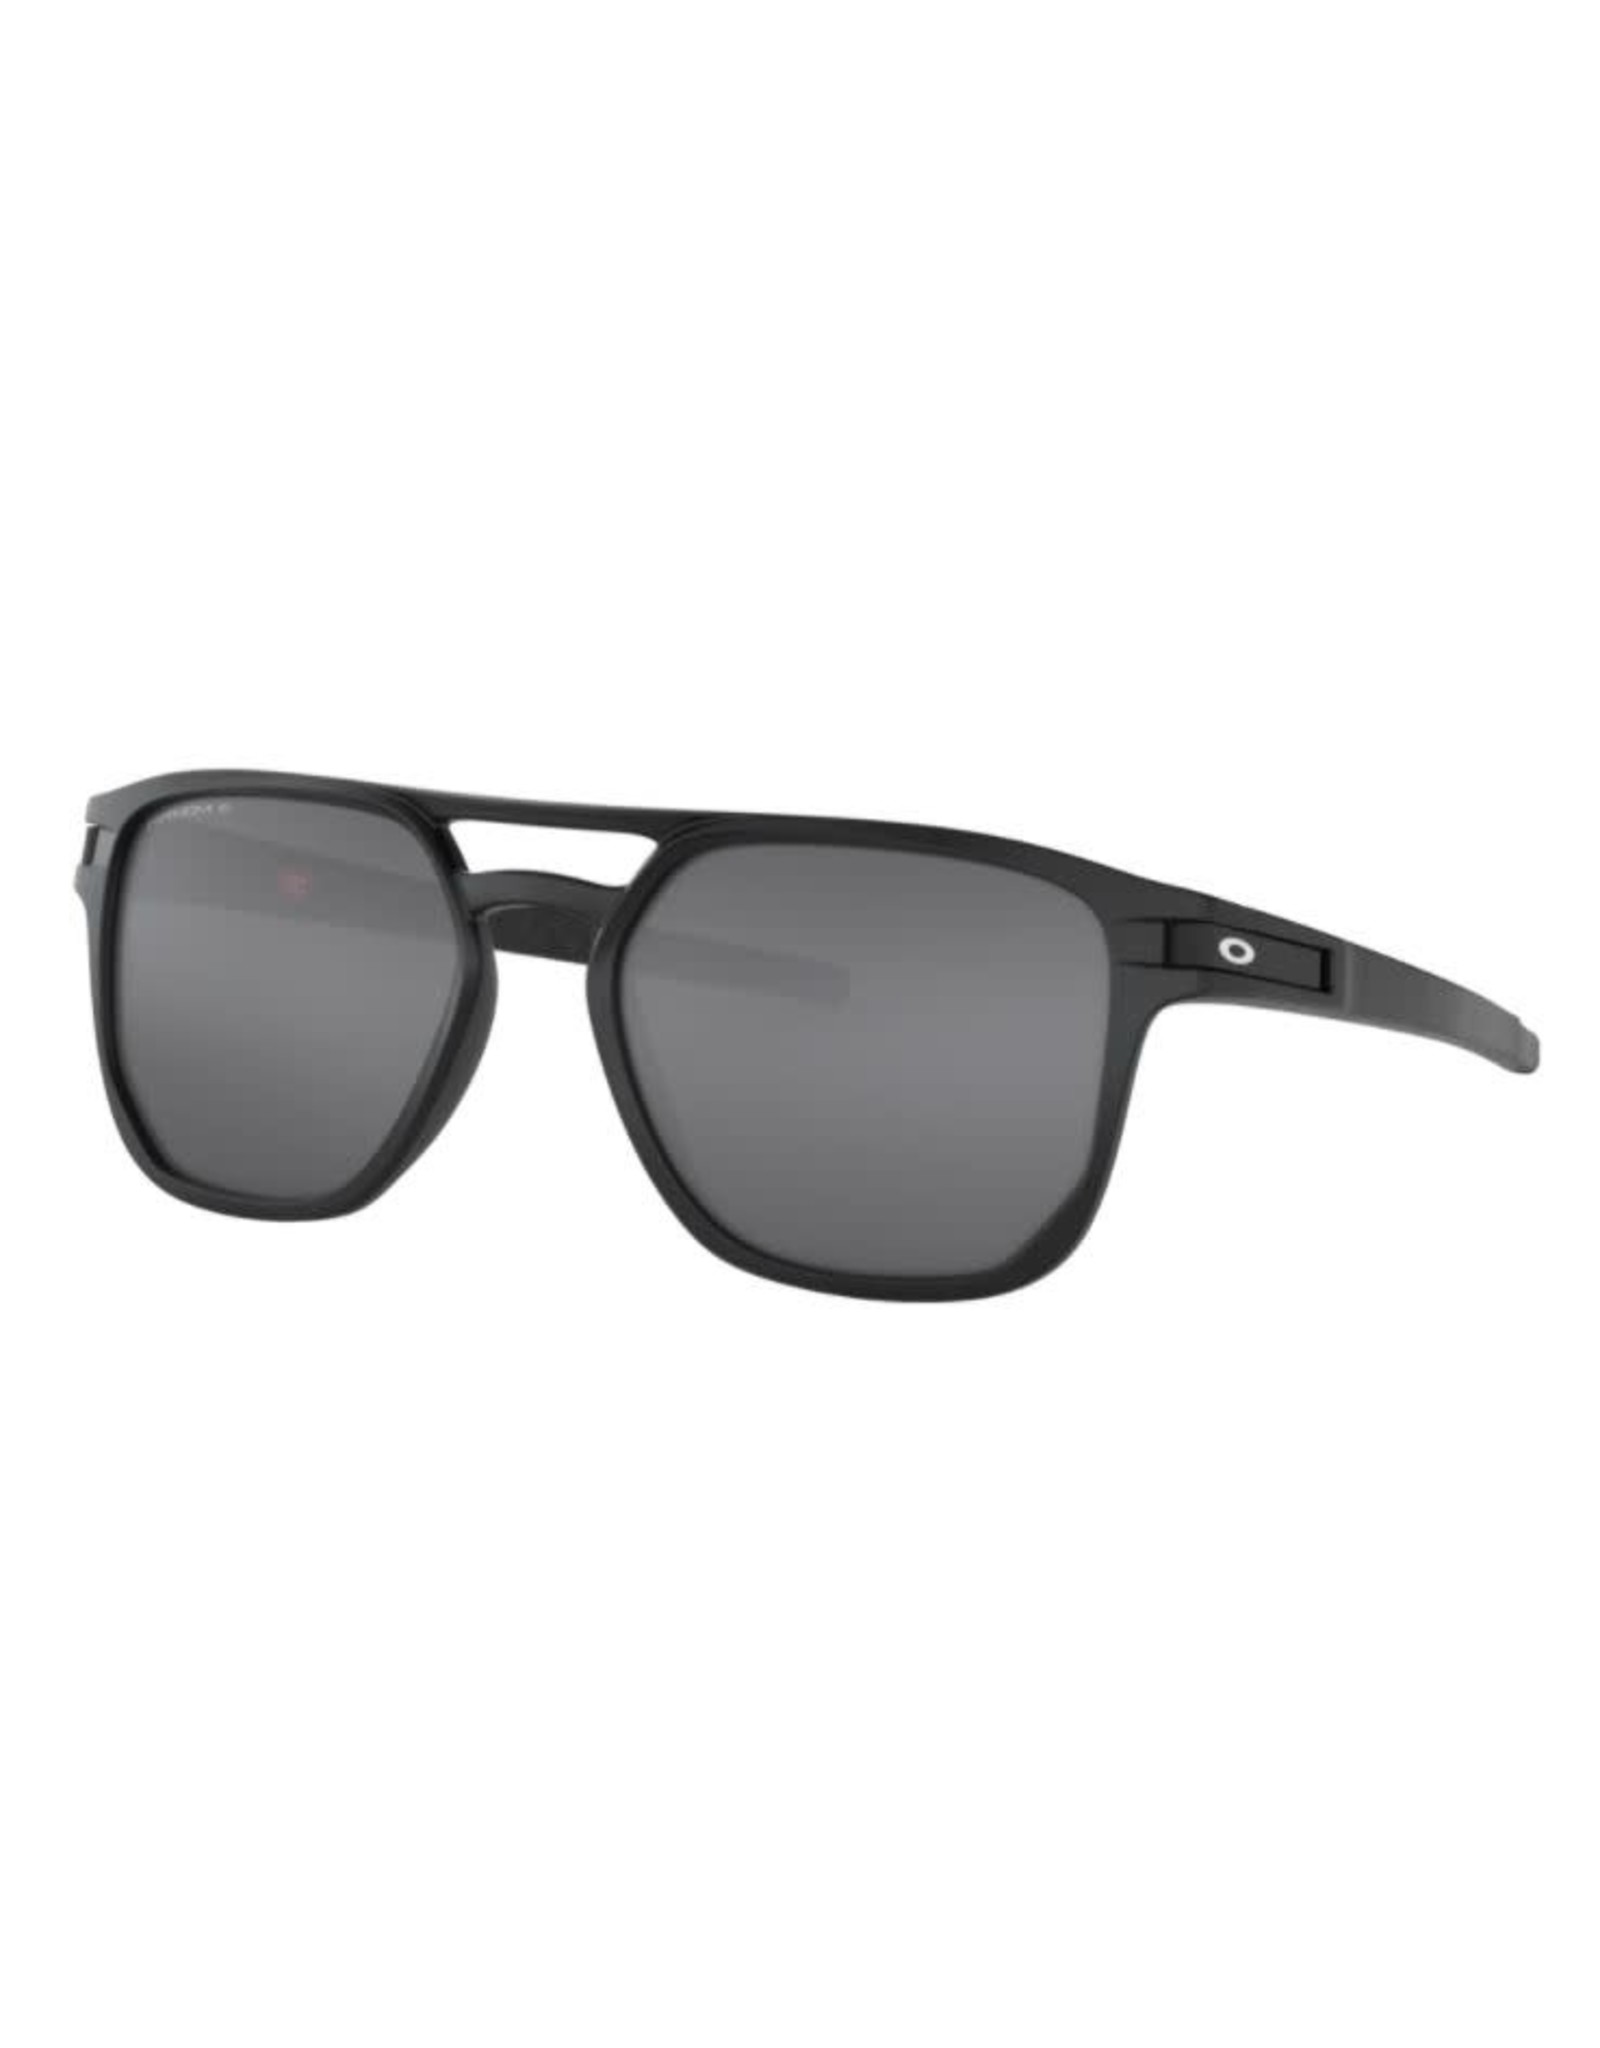 Oakley Oakley - Lunette soleil homme latch beta matte black/lens prizm black polarized